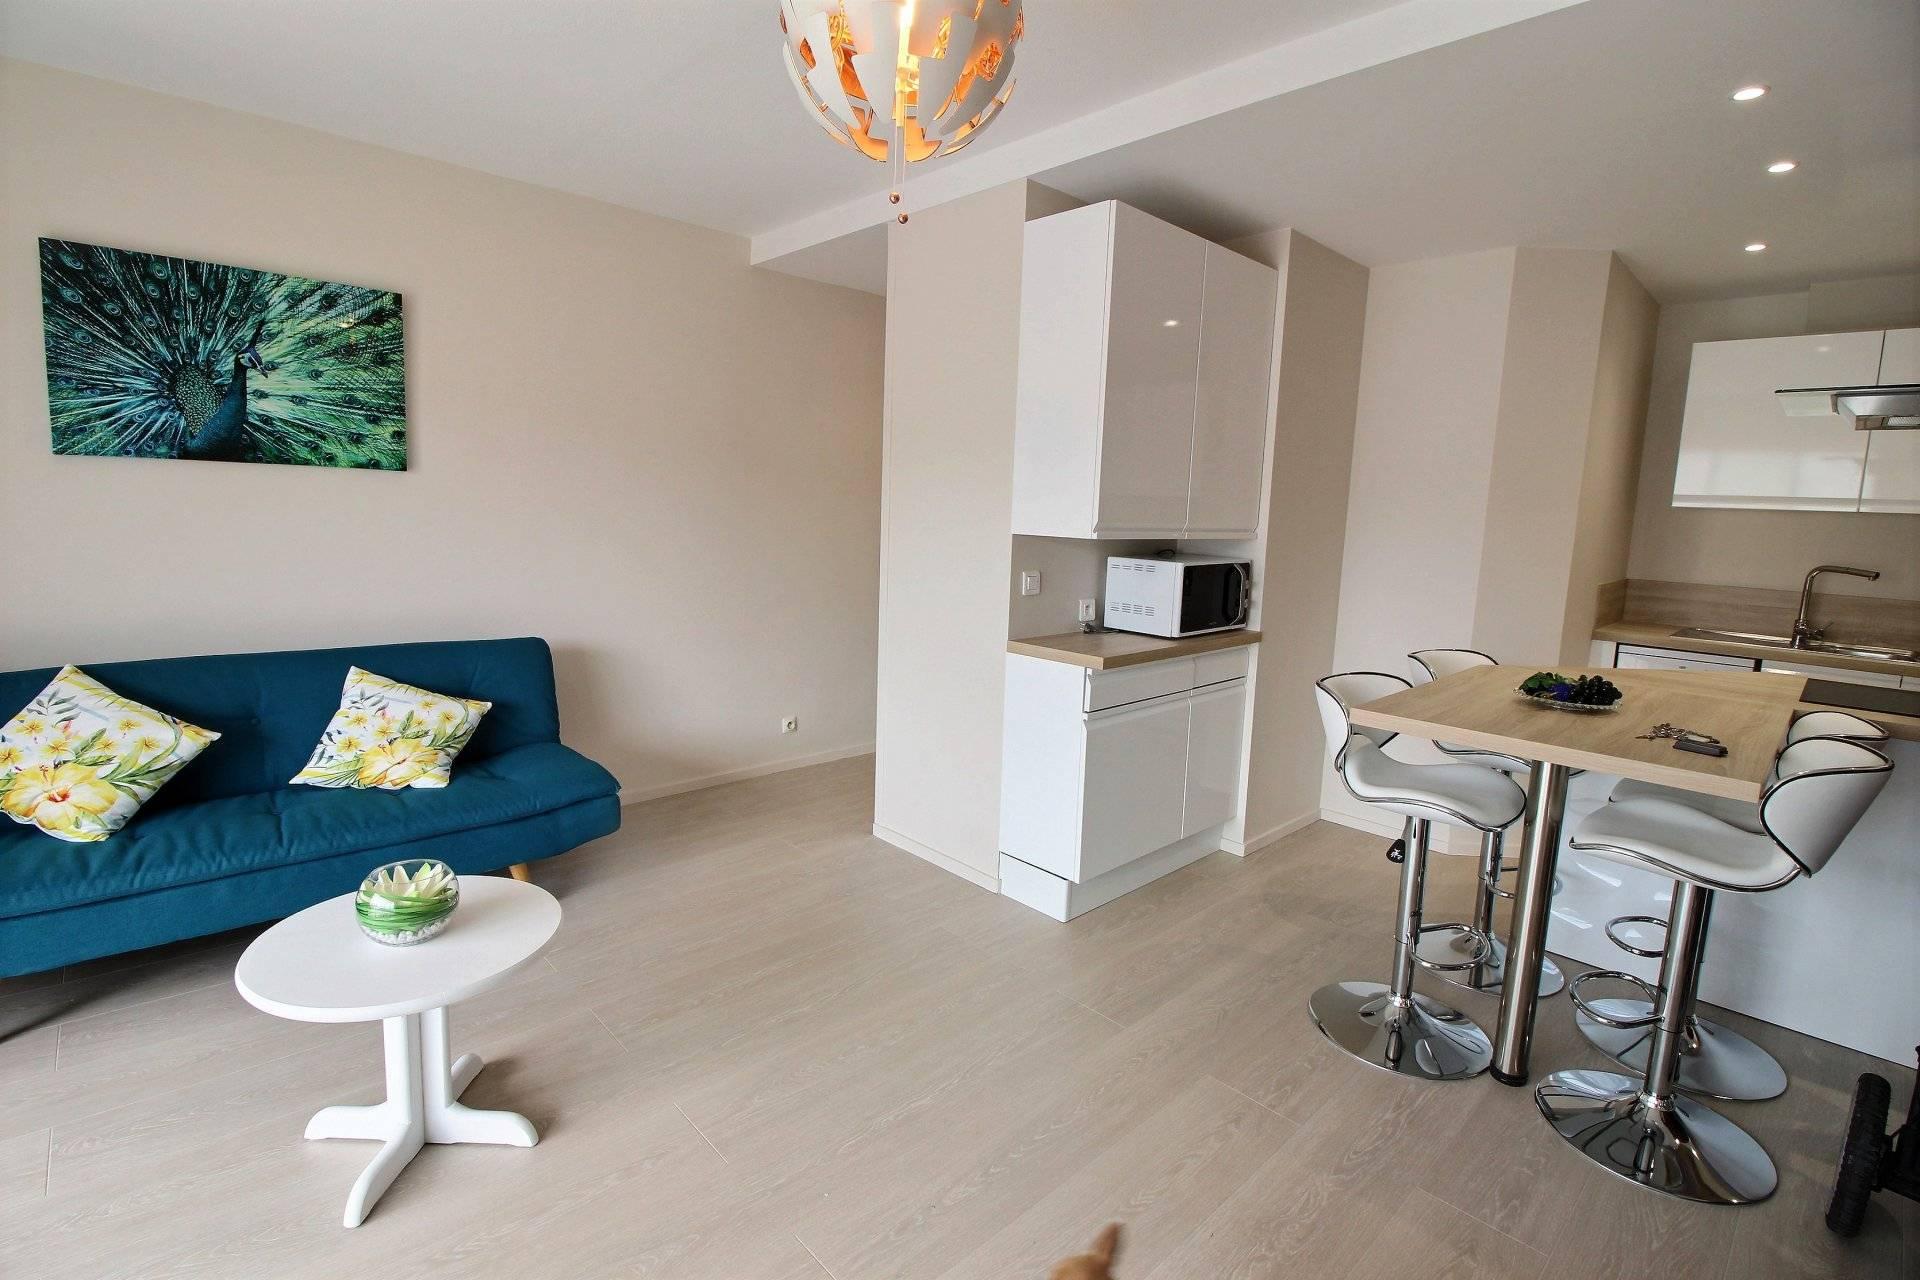 Appartement proche plage a vendre ARCACHON